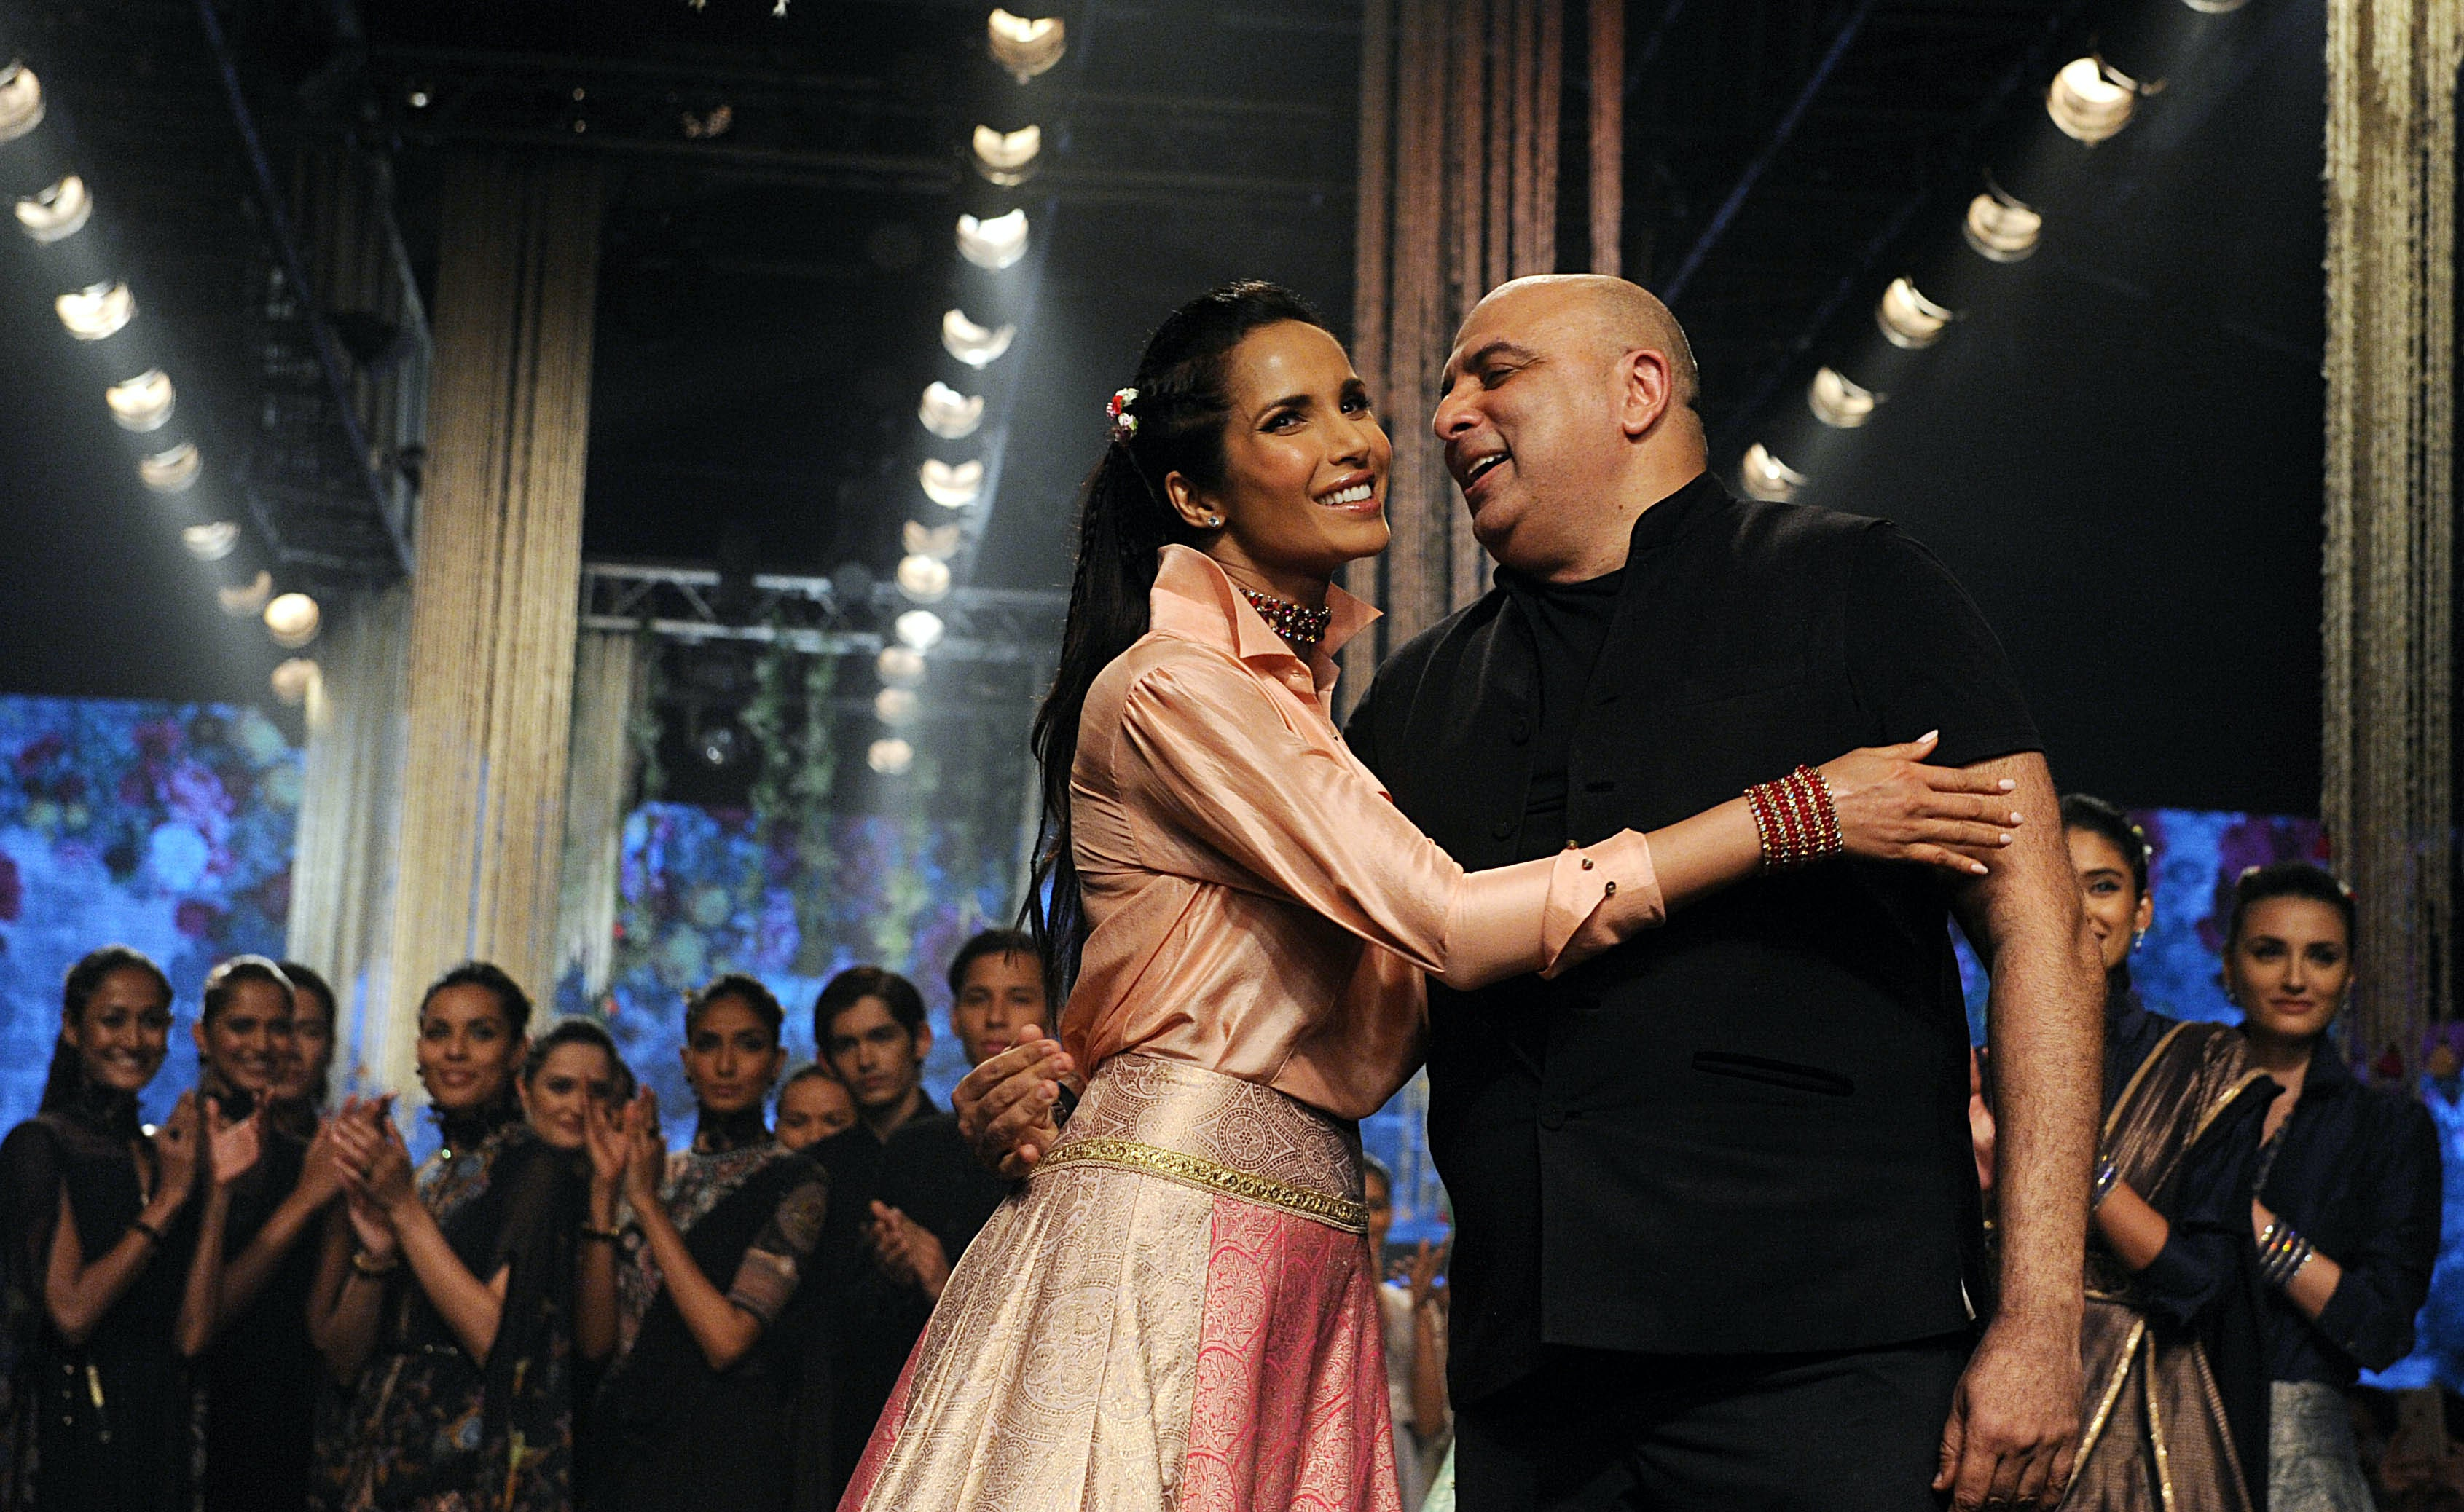 Padma Lakshmi with designer Tarun Tahiliani at Lakme Fashion Week | Source: Getty Images